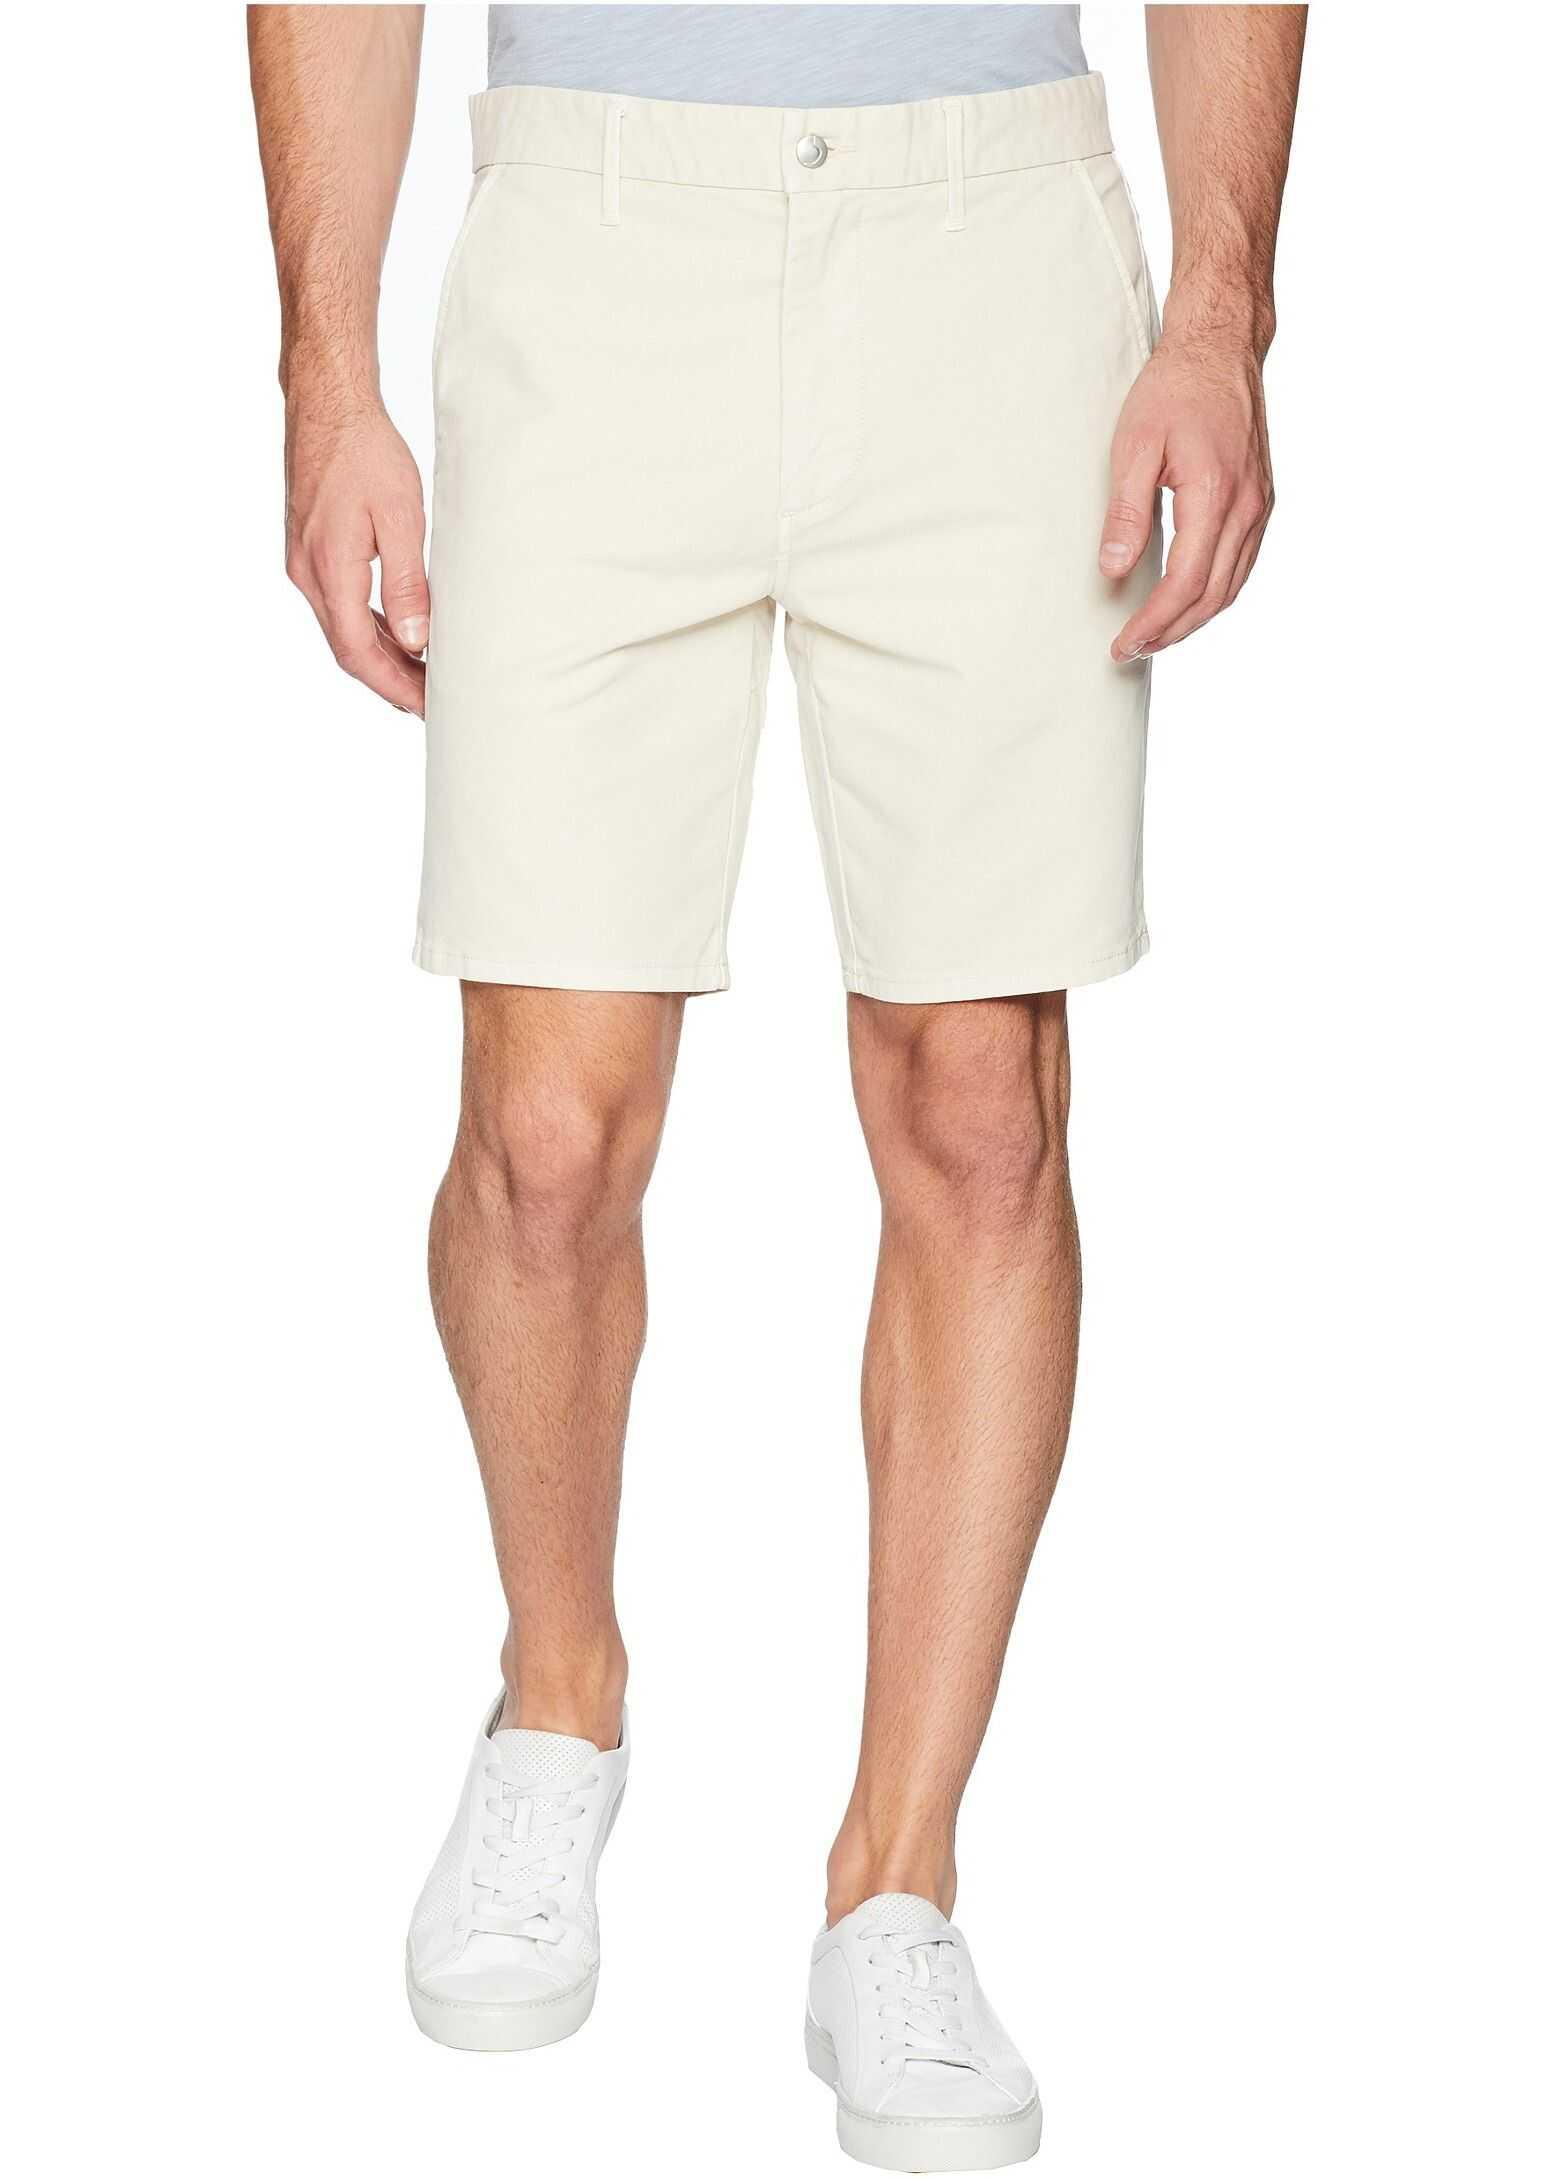 The Brixton Trouser Short